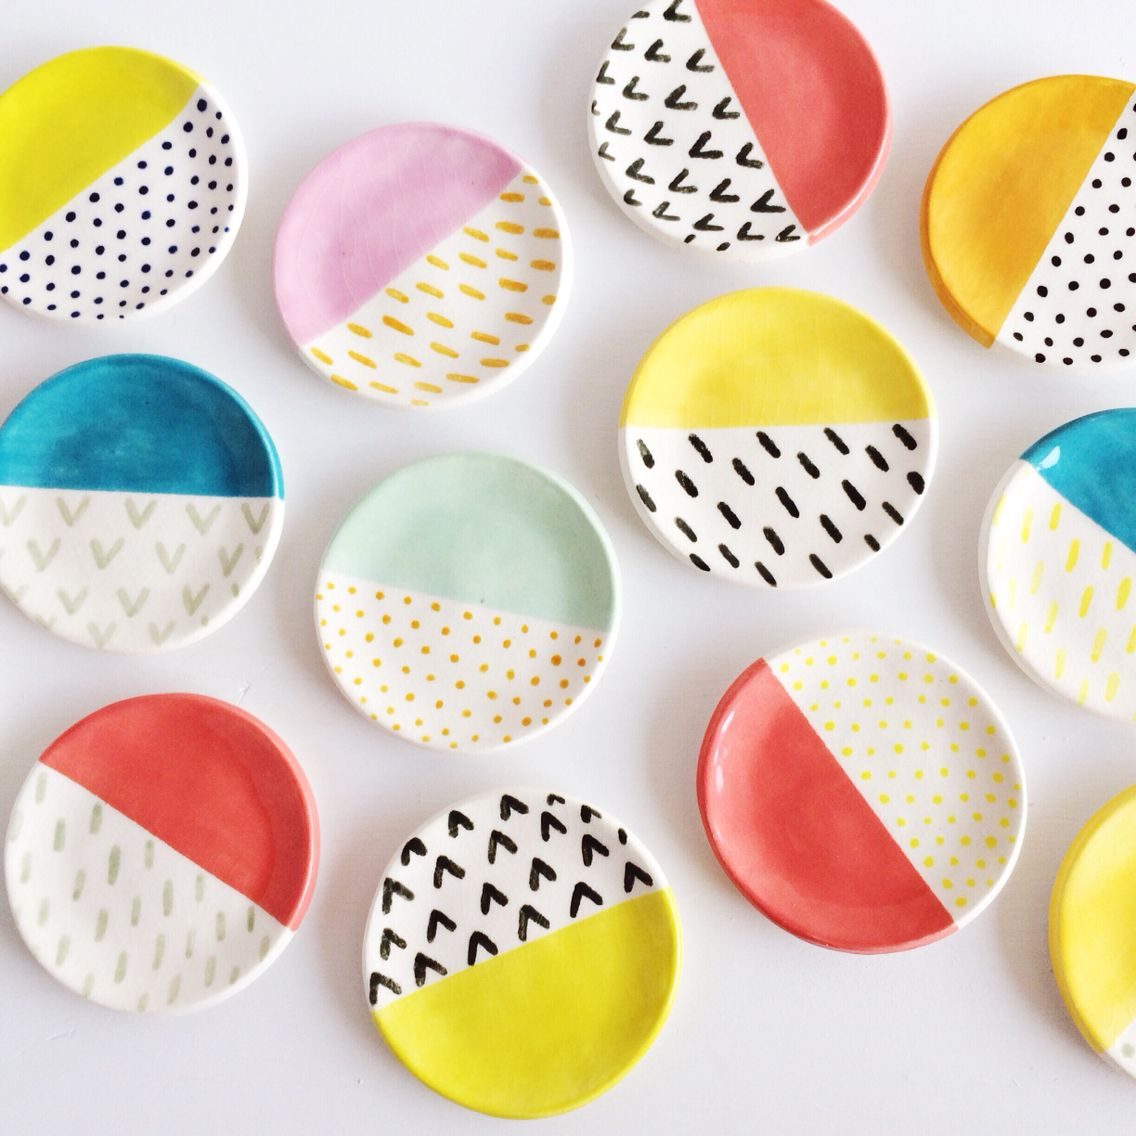 Diy Paint Ideas Colors And Patterns Quiet Clementine Pinteres